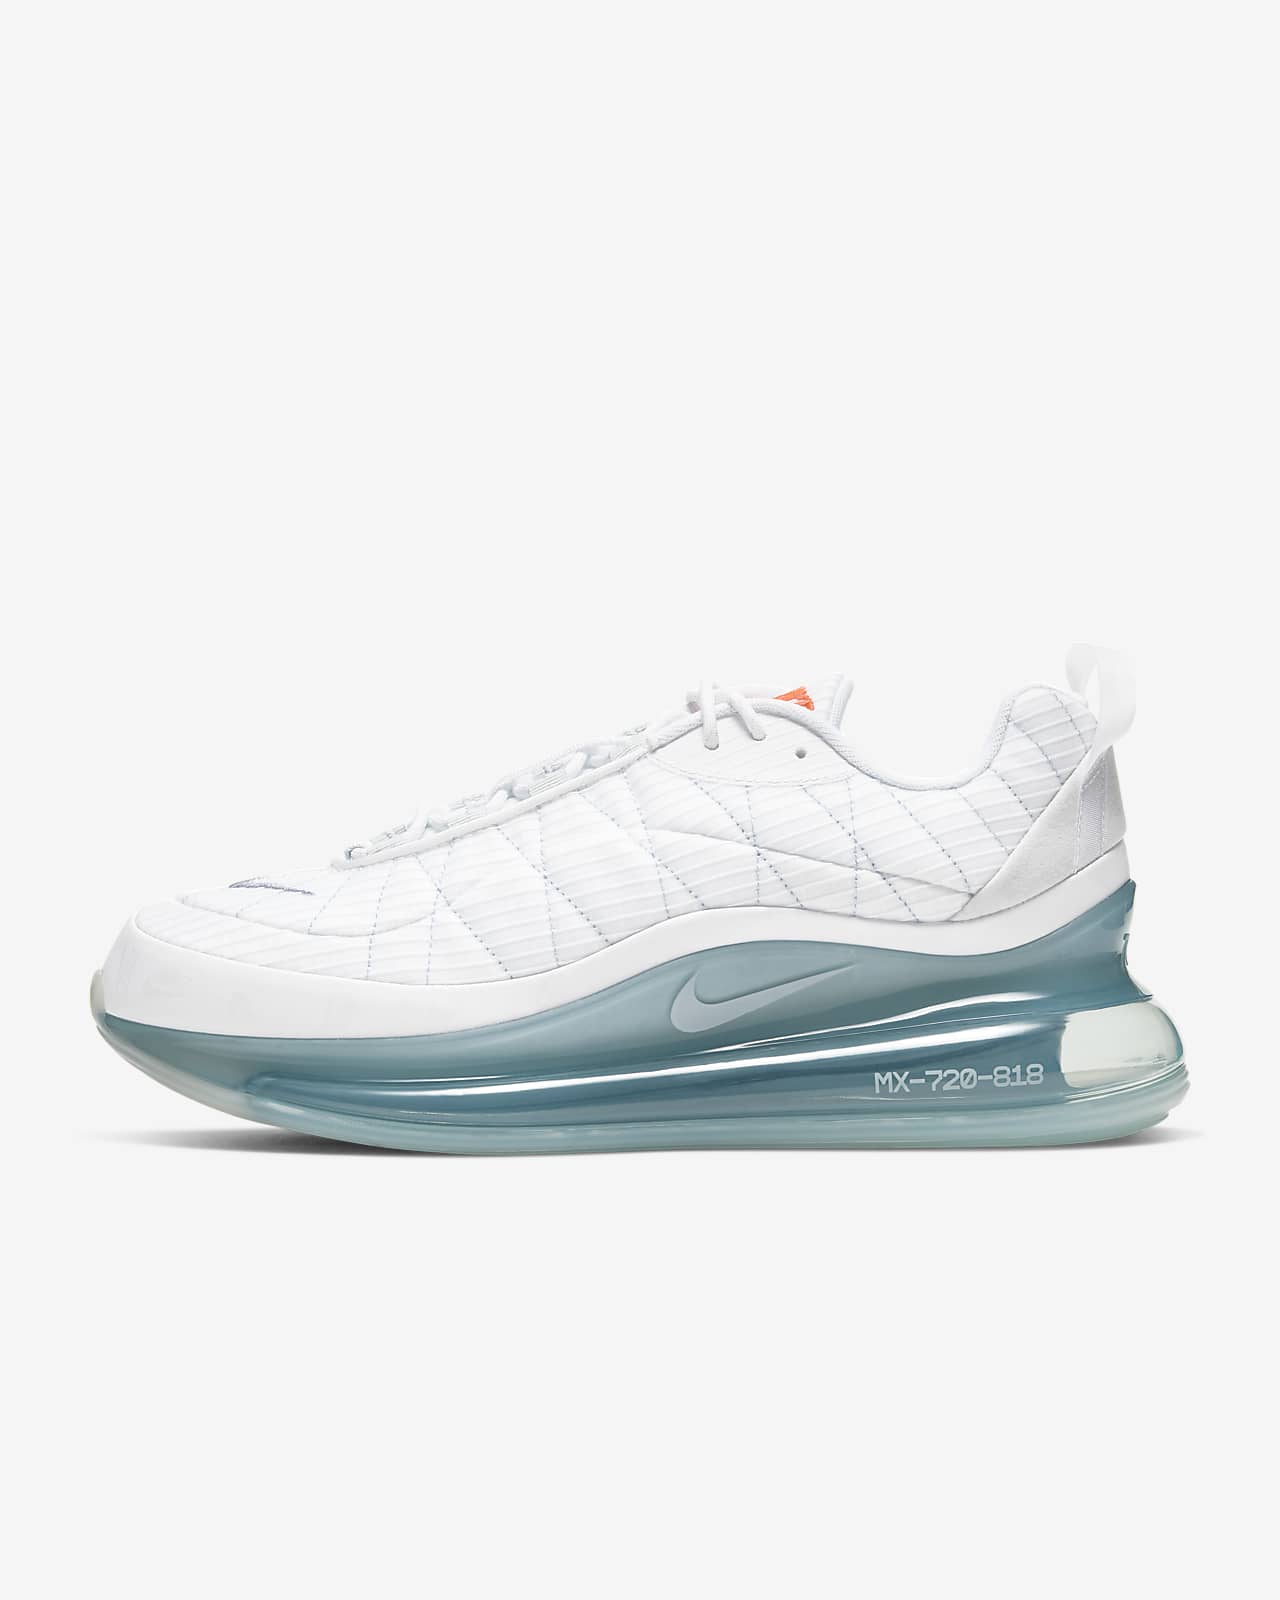 Nike MX-720-818 Zapatillas - Hombre